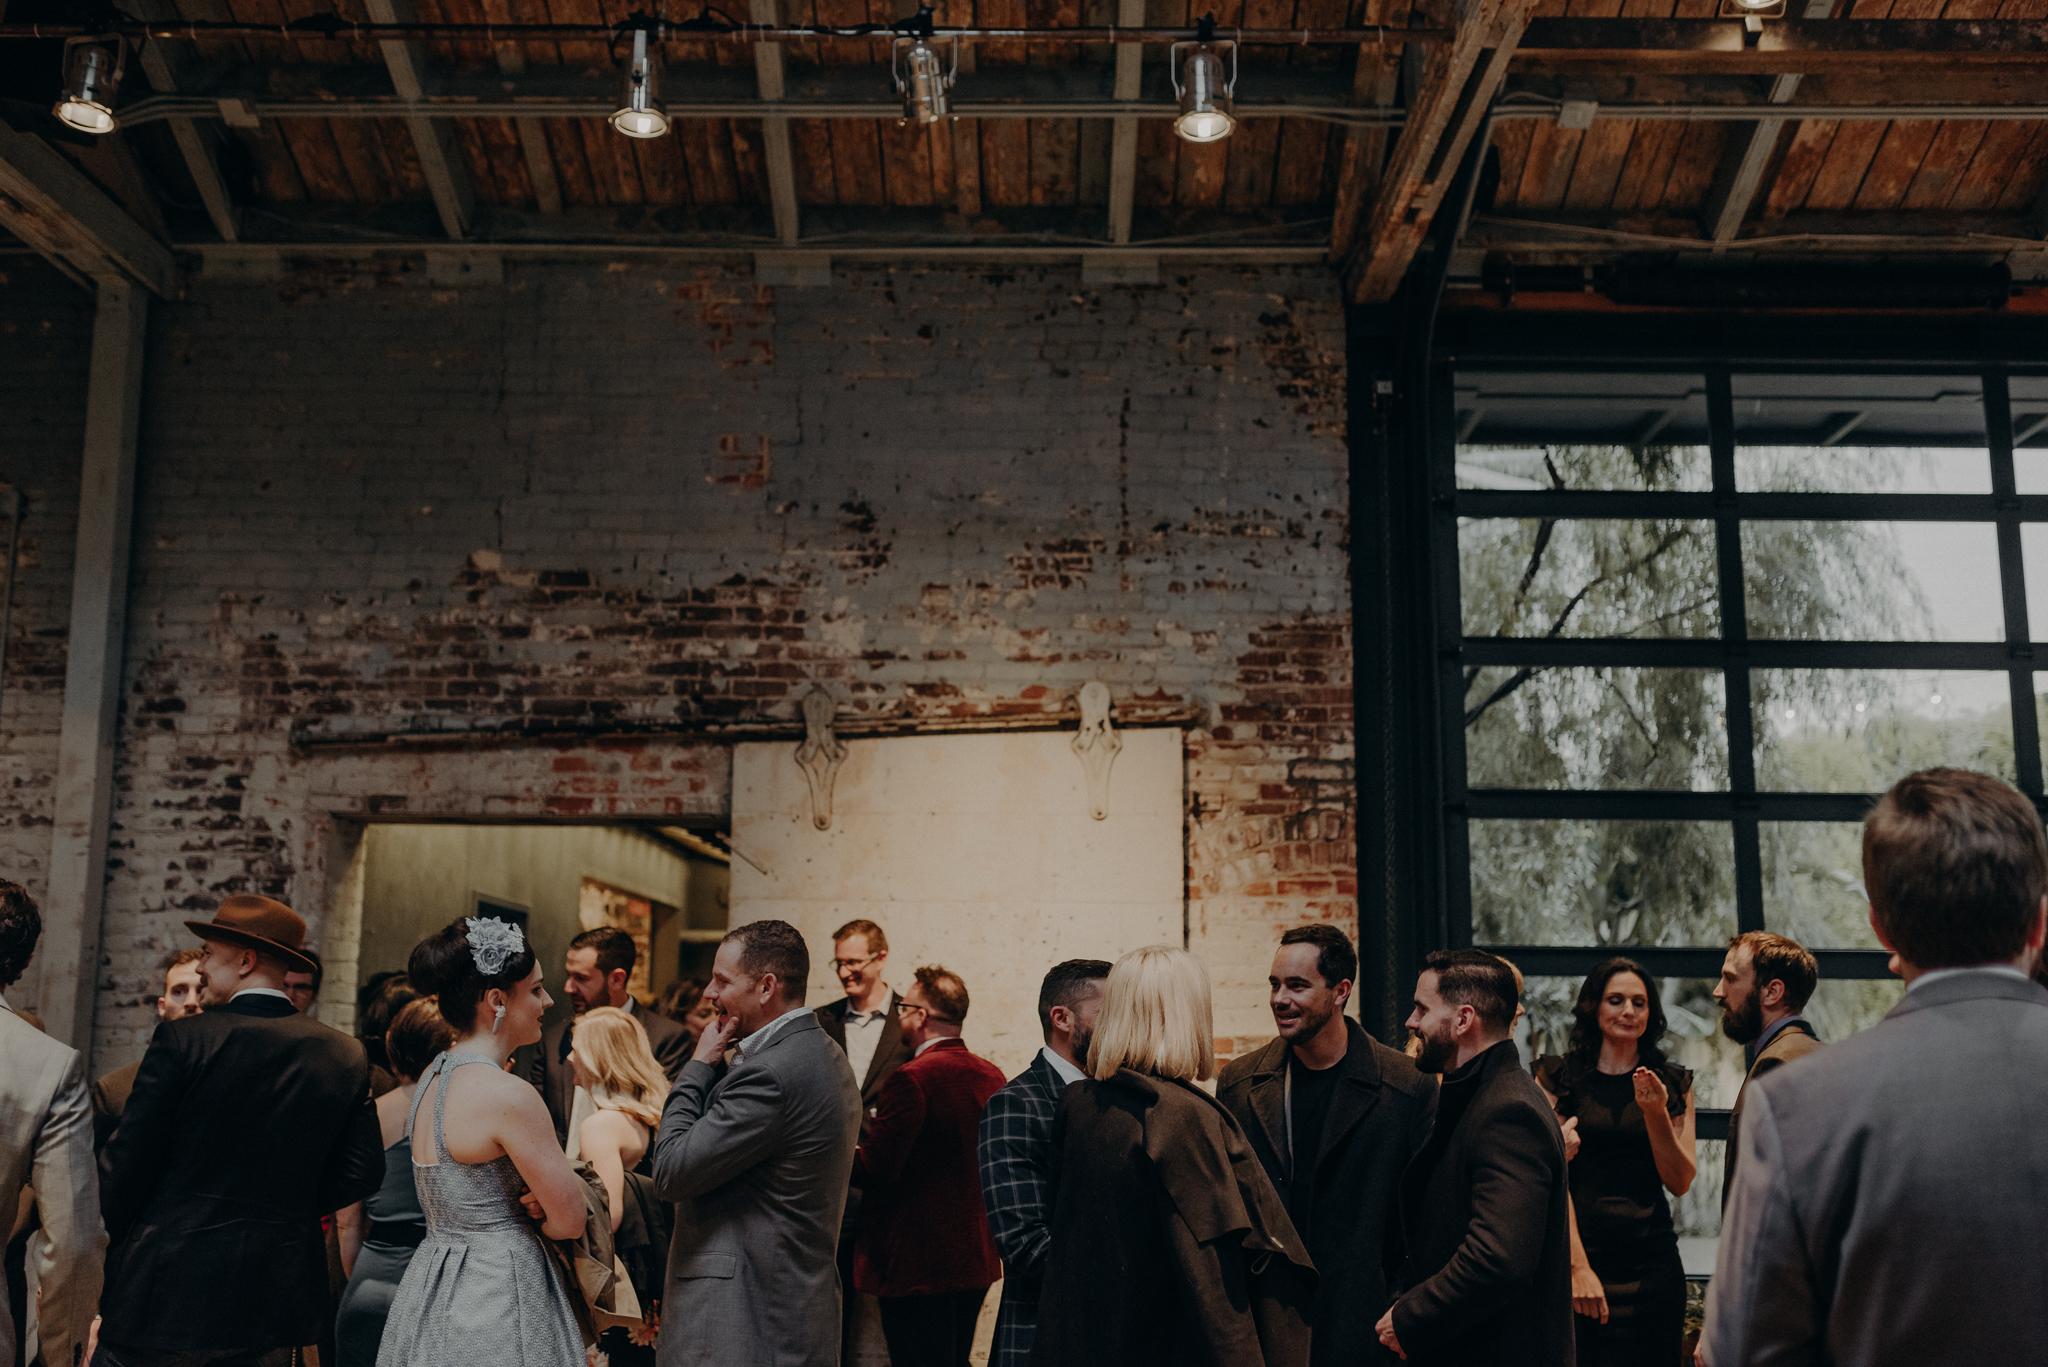 Wedding Photo LA - wedding photographer in los angeles - millwick wedding venue -isaiahandtaylor.com-089.jpg